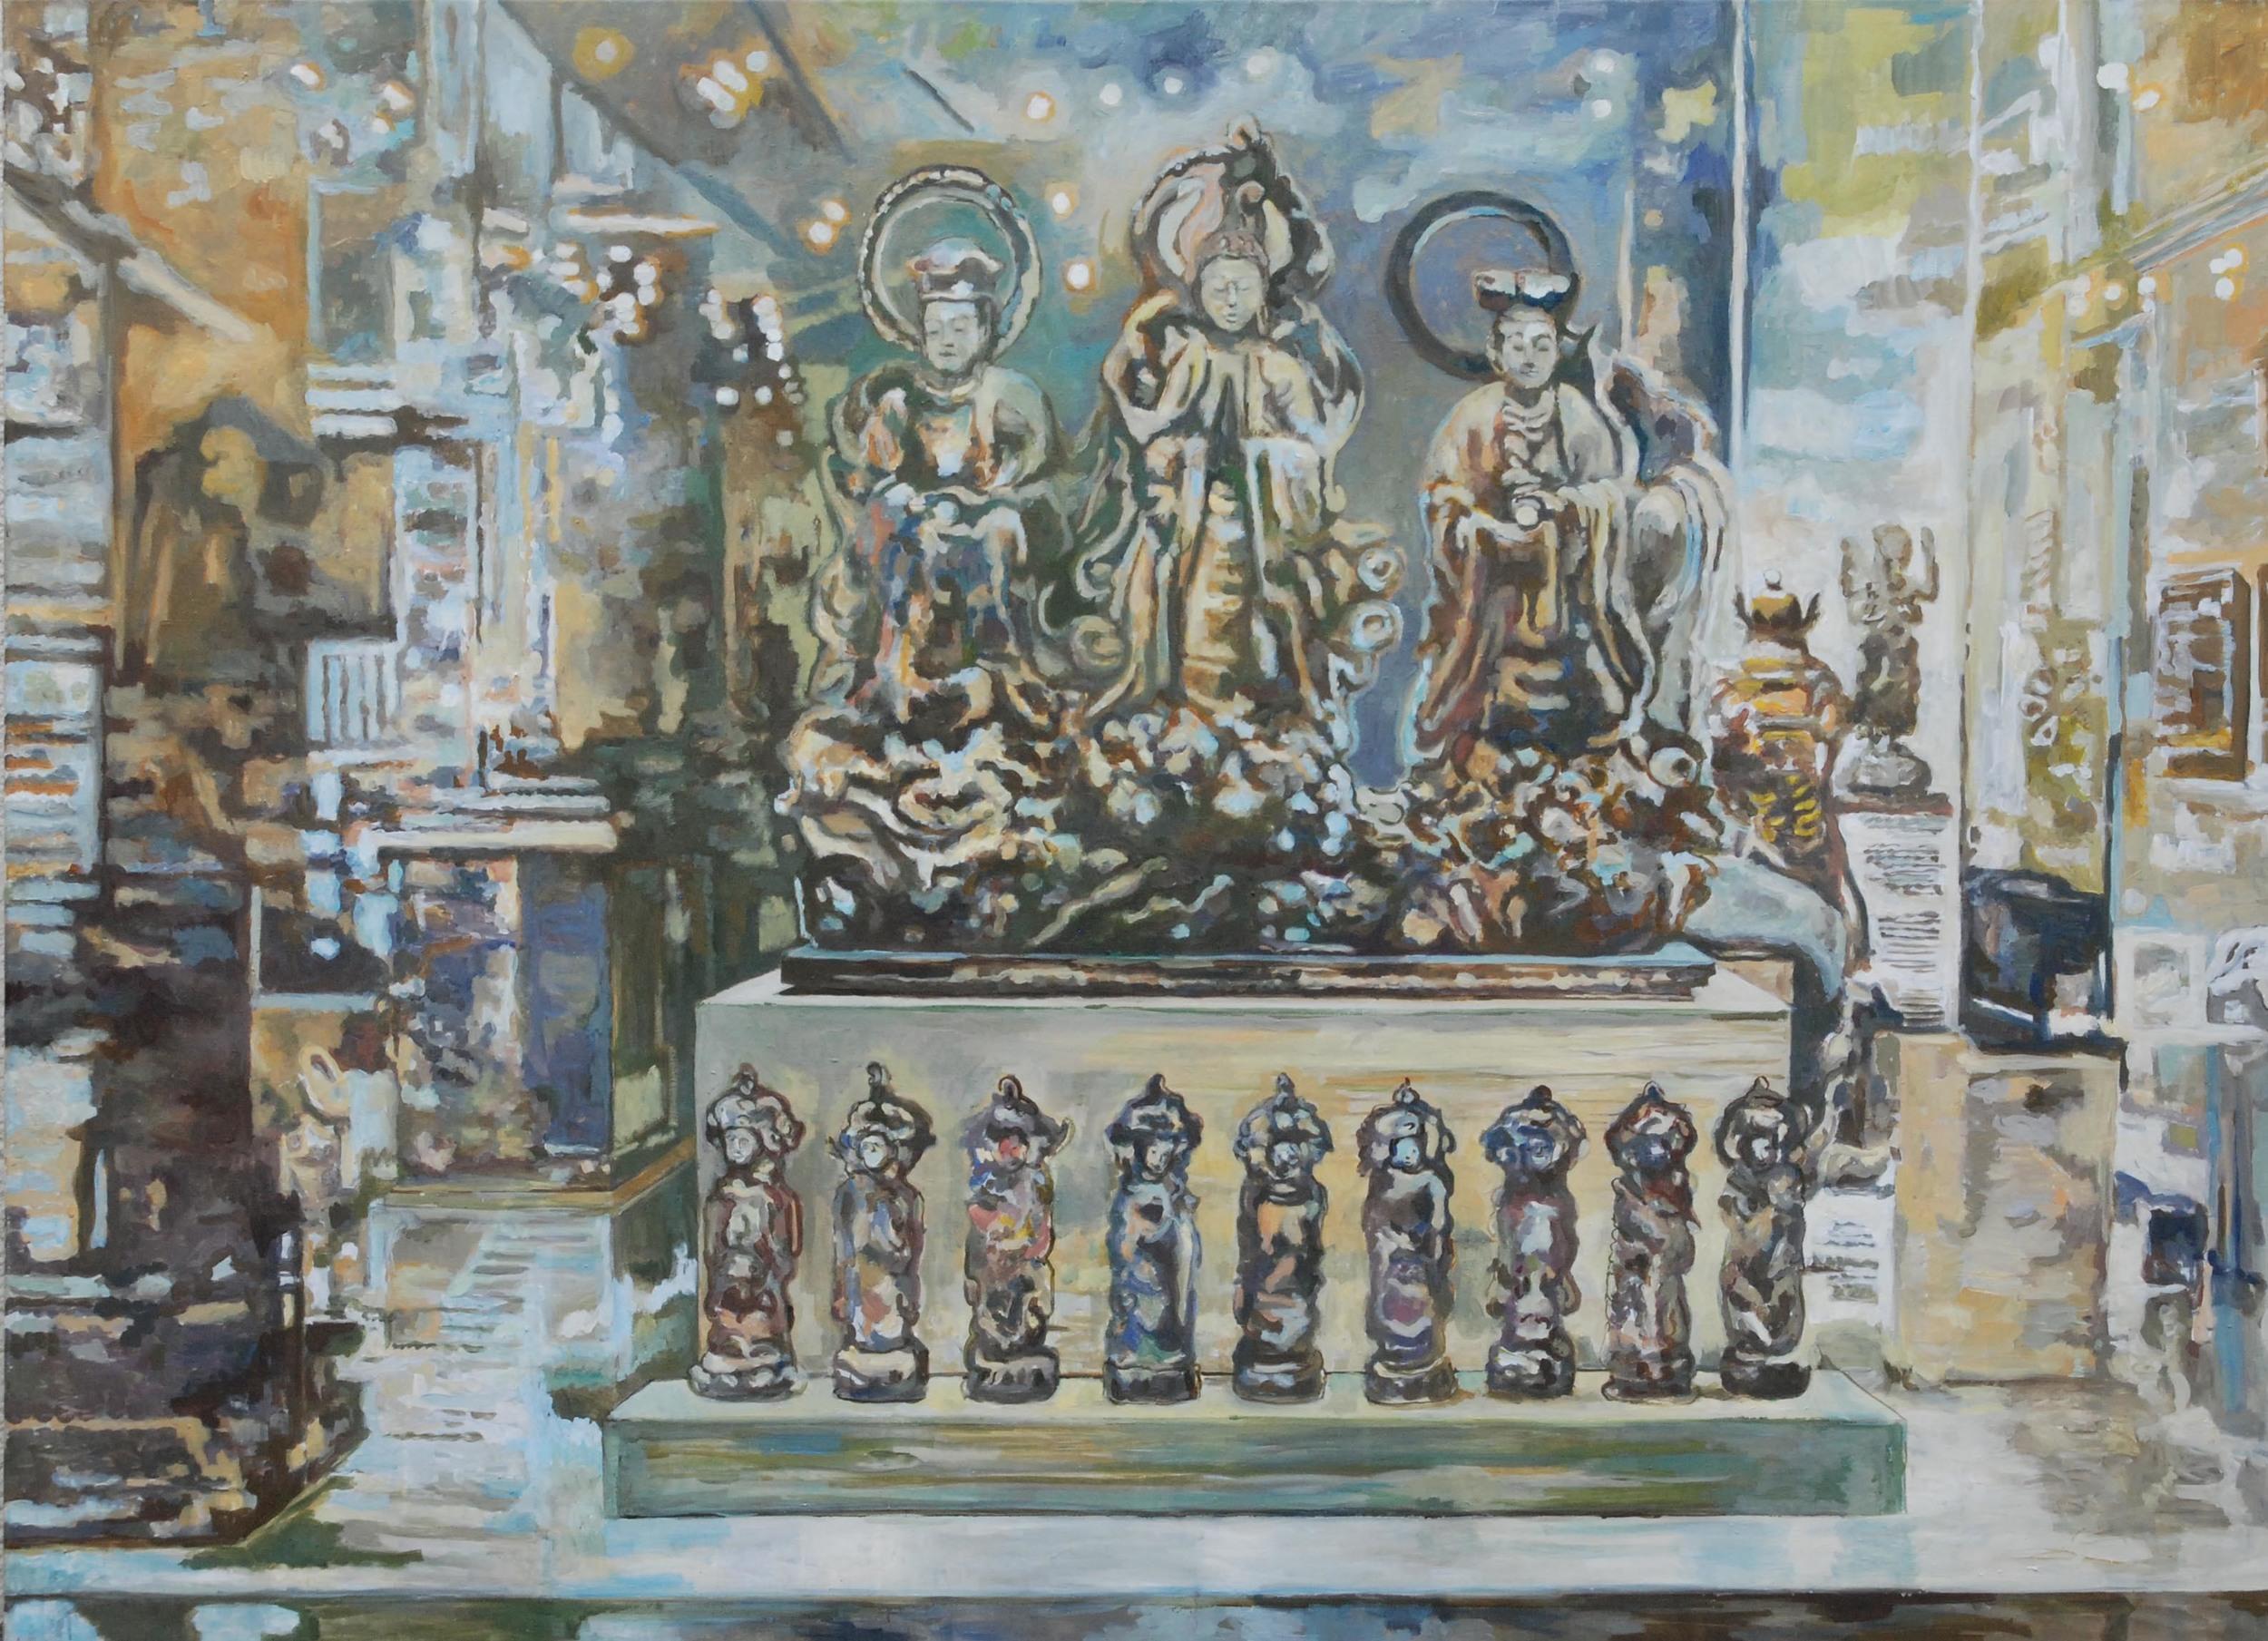 showcase, giumet   oil & eggtempera on canvas  150 x 195 cm   1997